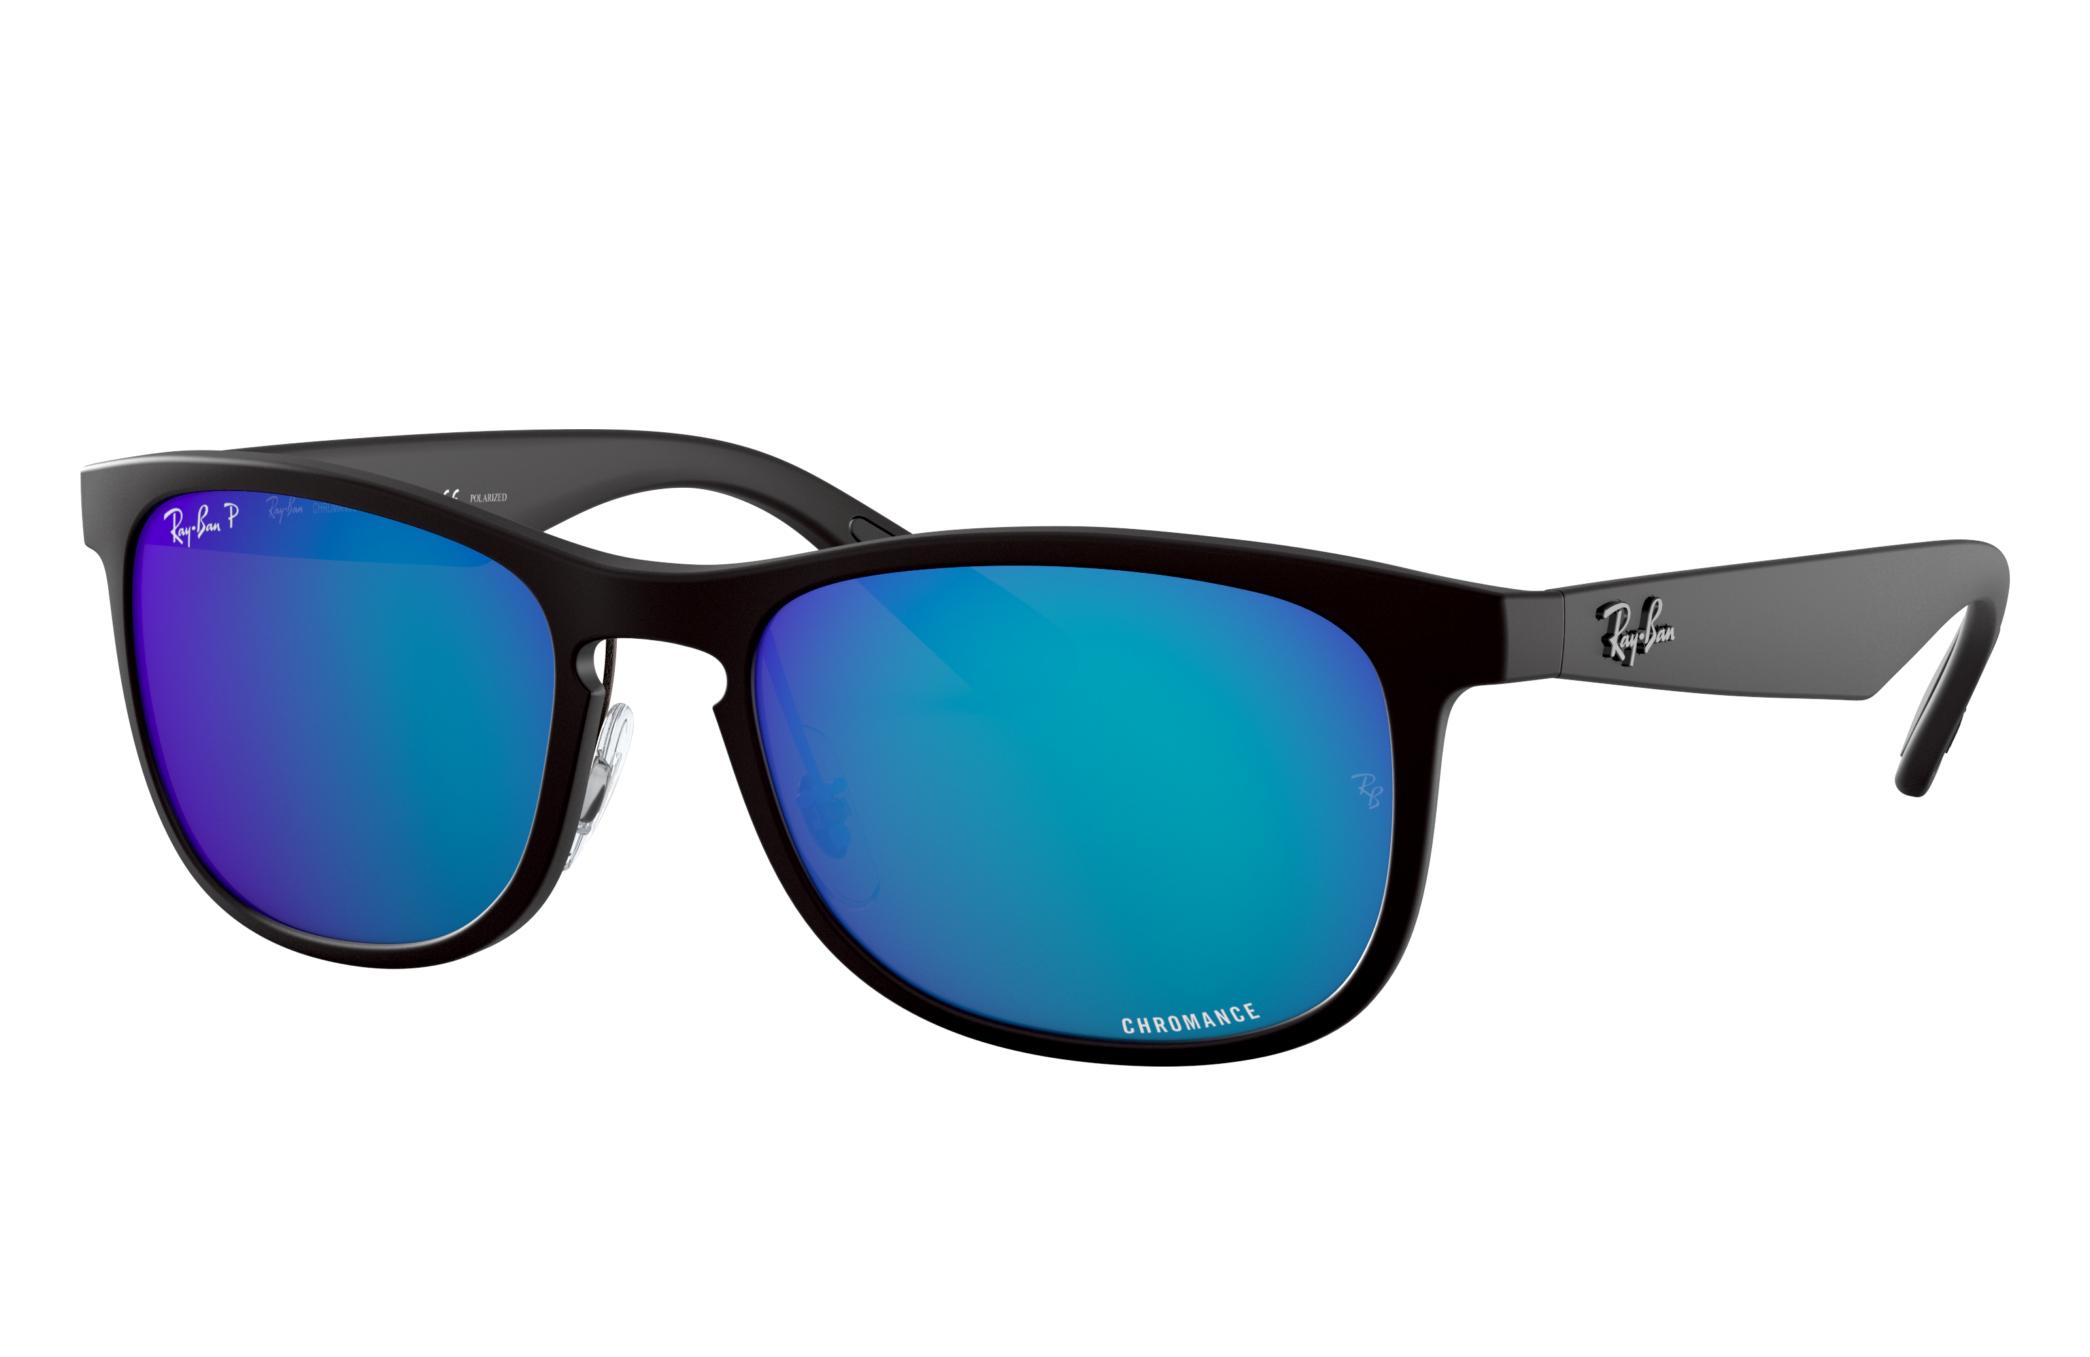 Ray-Ban Rb4263 Chromance Black, Polarized Blue Lenses - RB4263